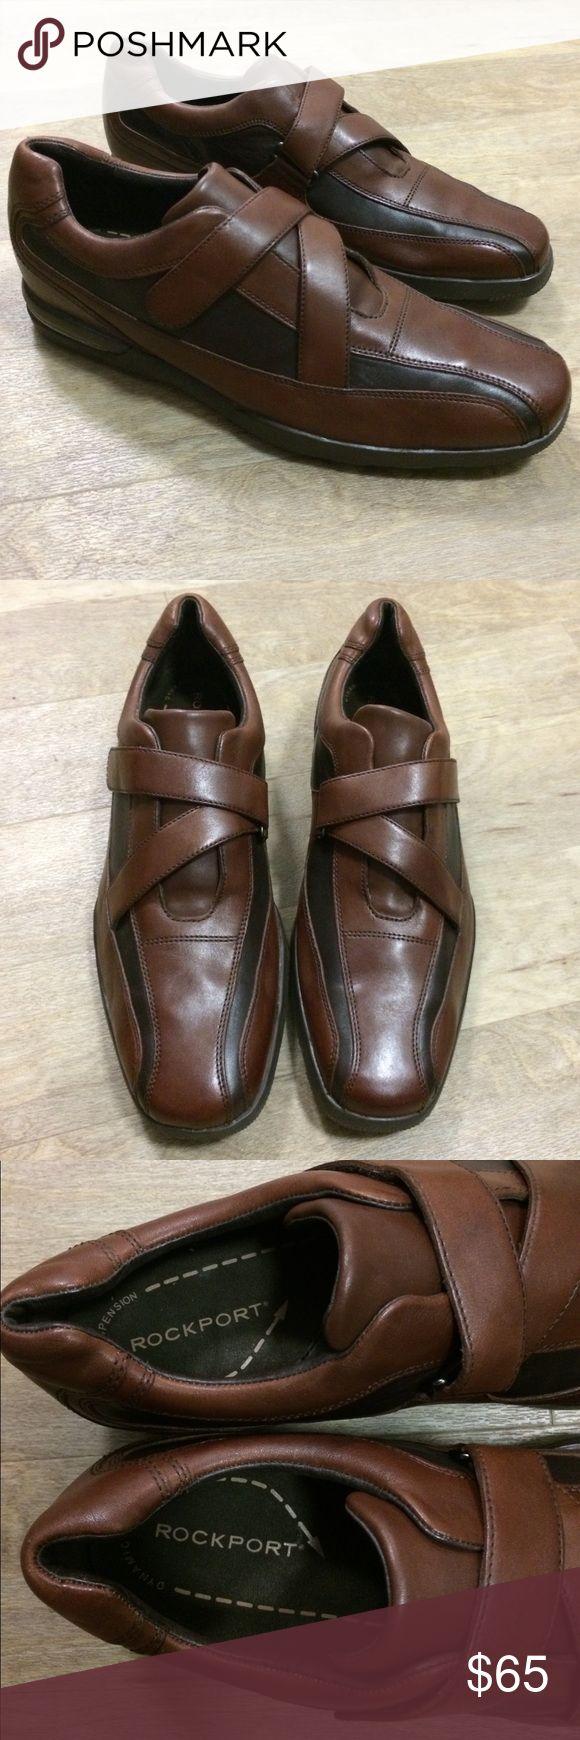 Rockport Remington Leather Shoes Size 11 Size 11 Color: Brown/Dark Brown Rockport Shoes